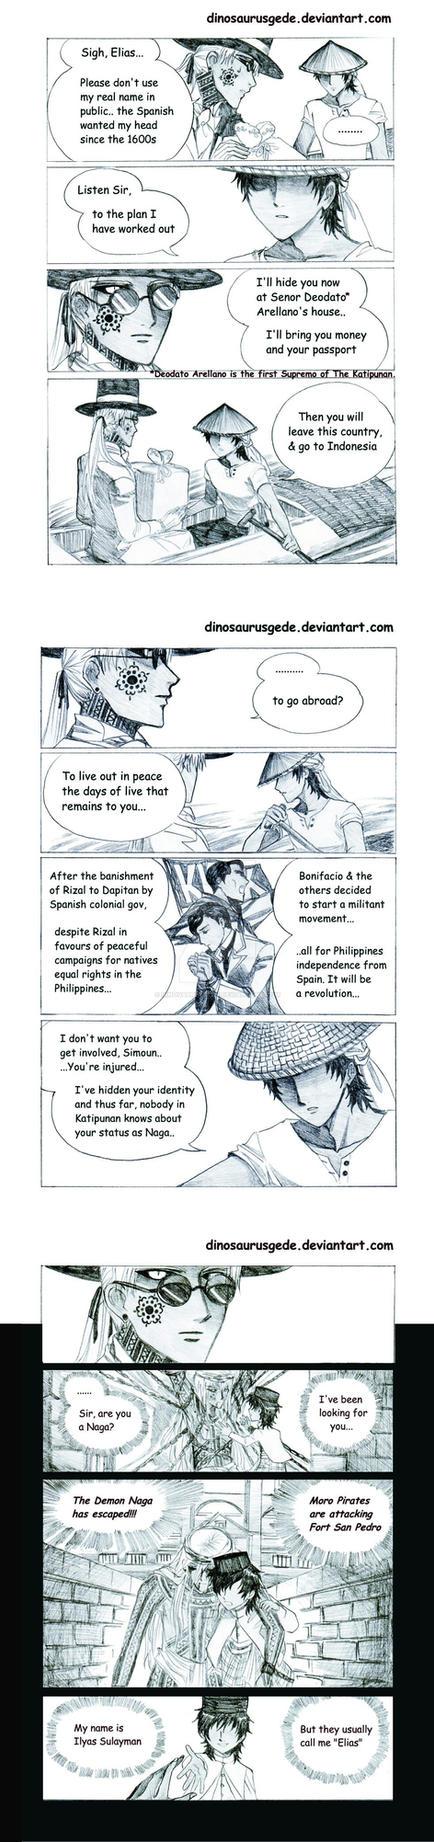 Nagaraja Chapter 4 Part 3 by dinosaurusgede